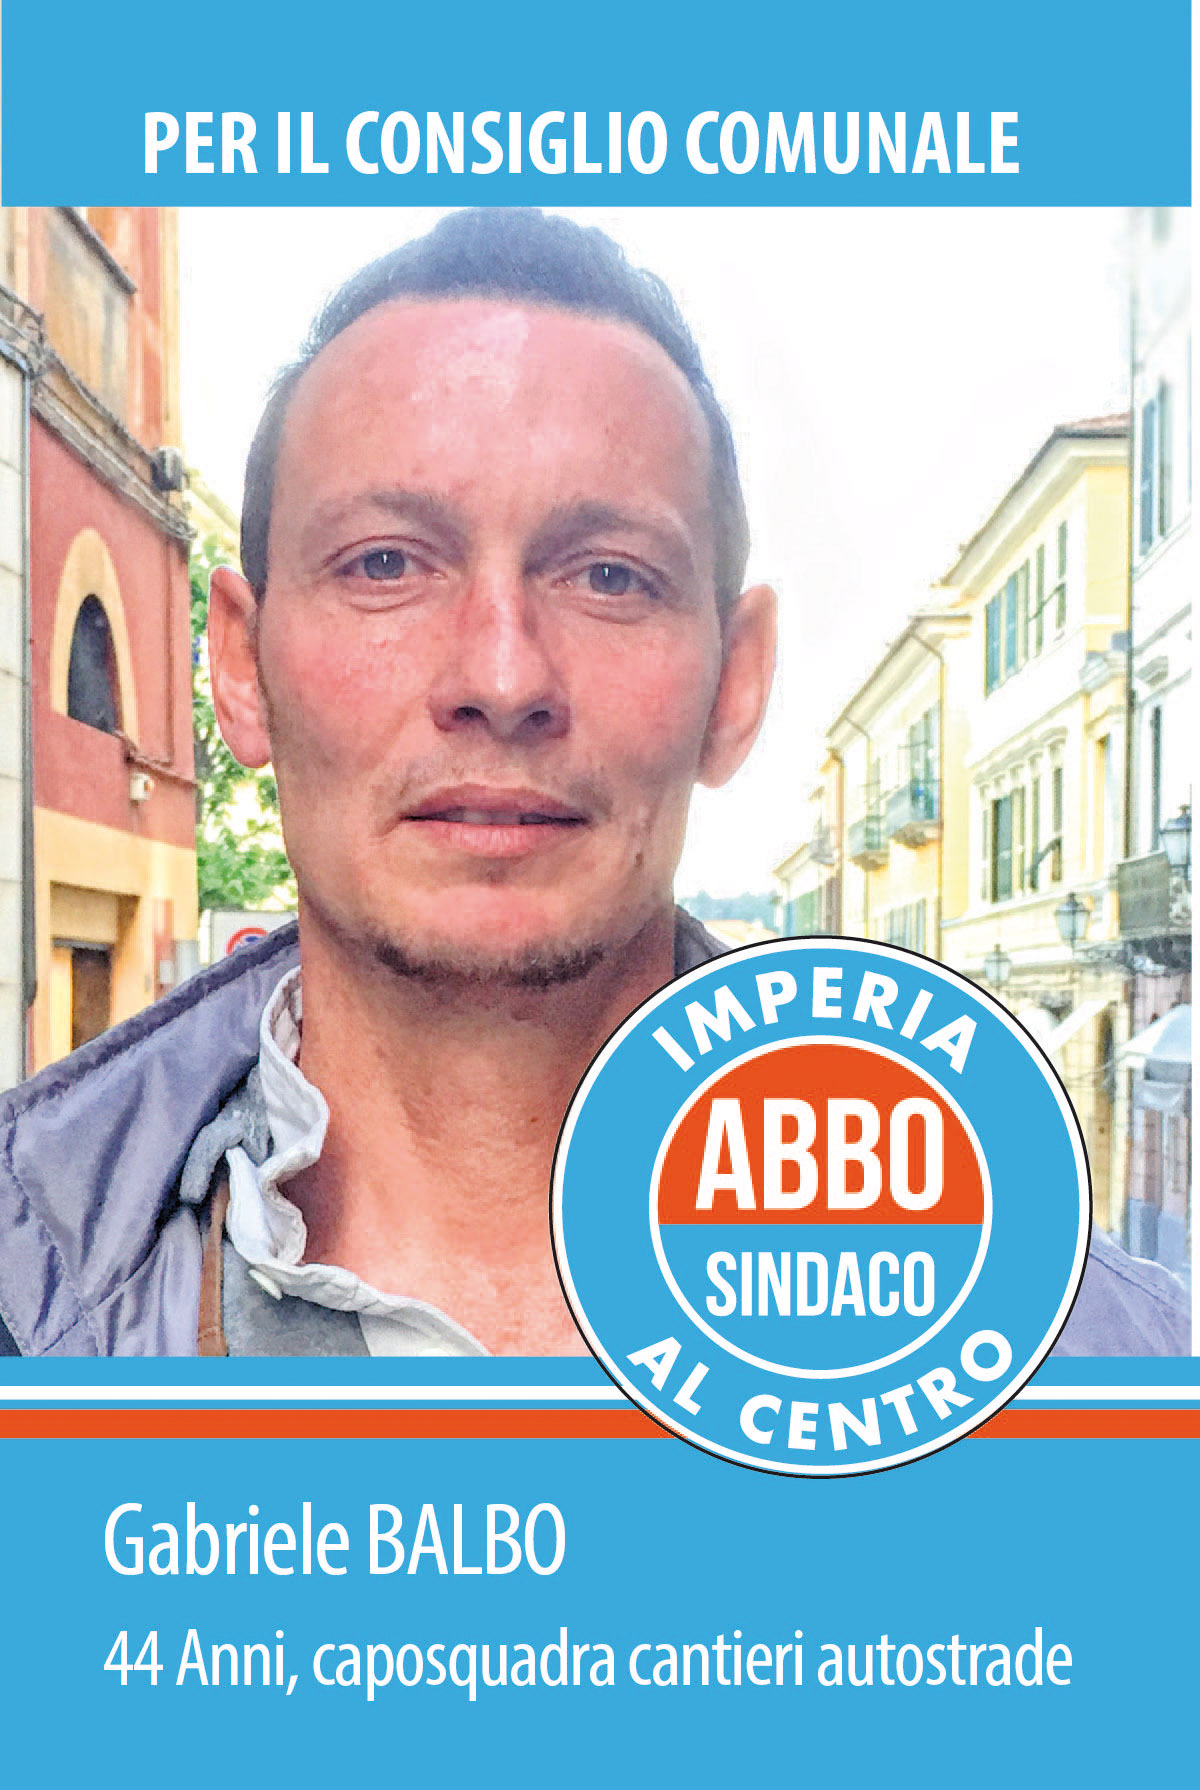 Gabriele BALBO